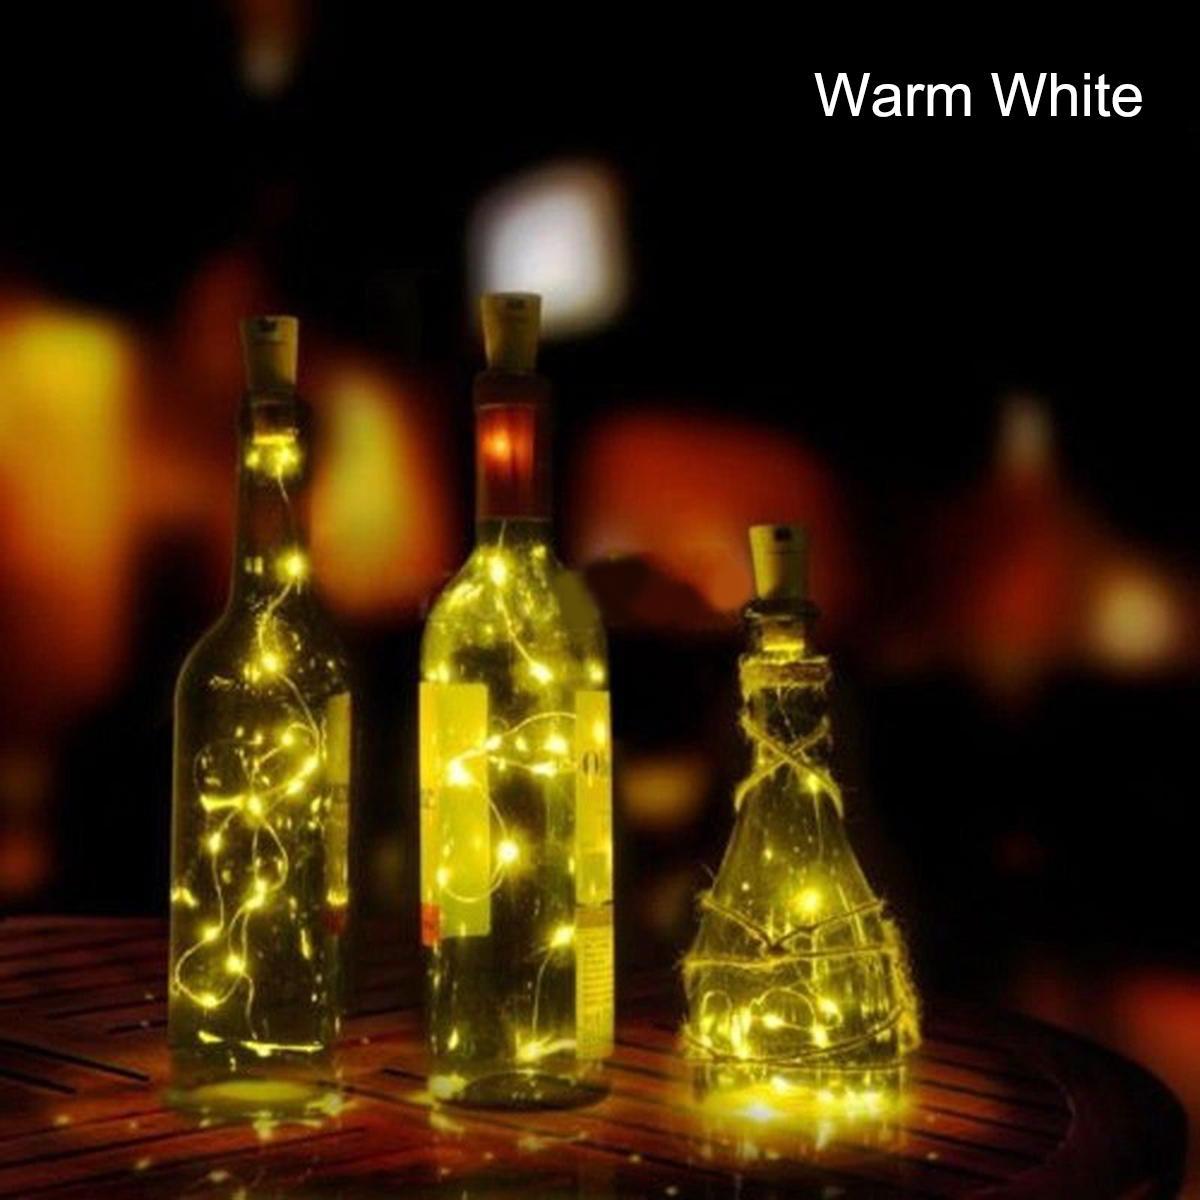 1pcs Solar 2m Led Cork Shaped 20 Led Night Fairy String Light Kork Solarbetrieben Licht Wine Bottle Lamp Party Celebration Gift Valentines Blue By Ycitc.